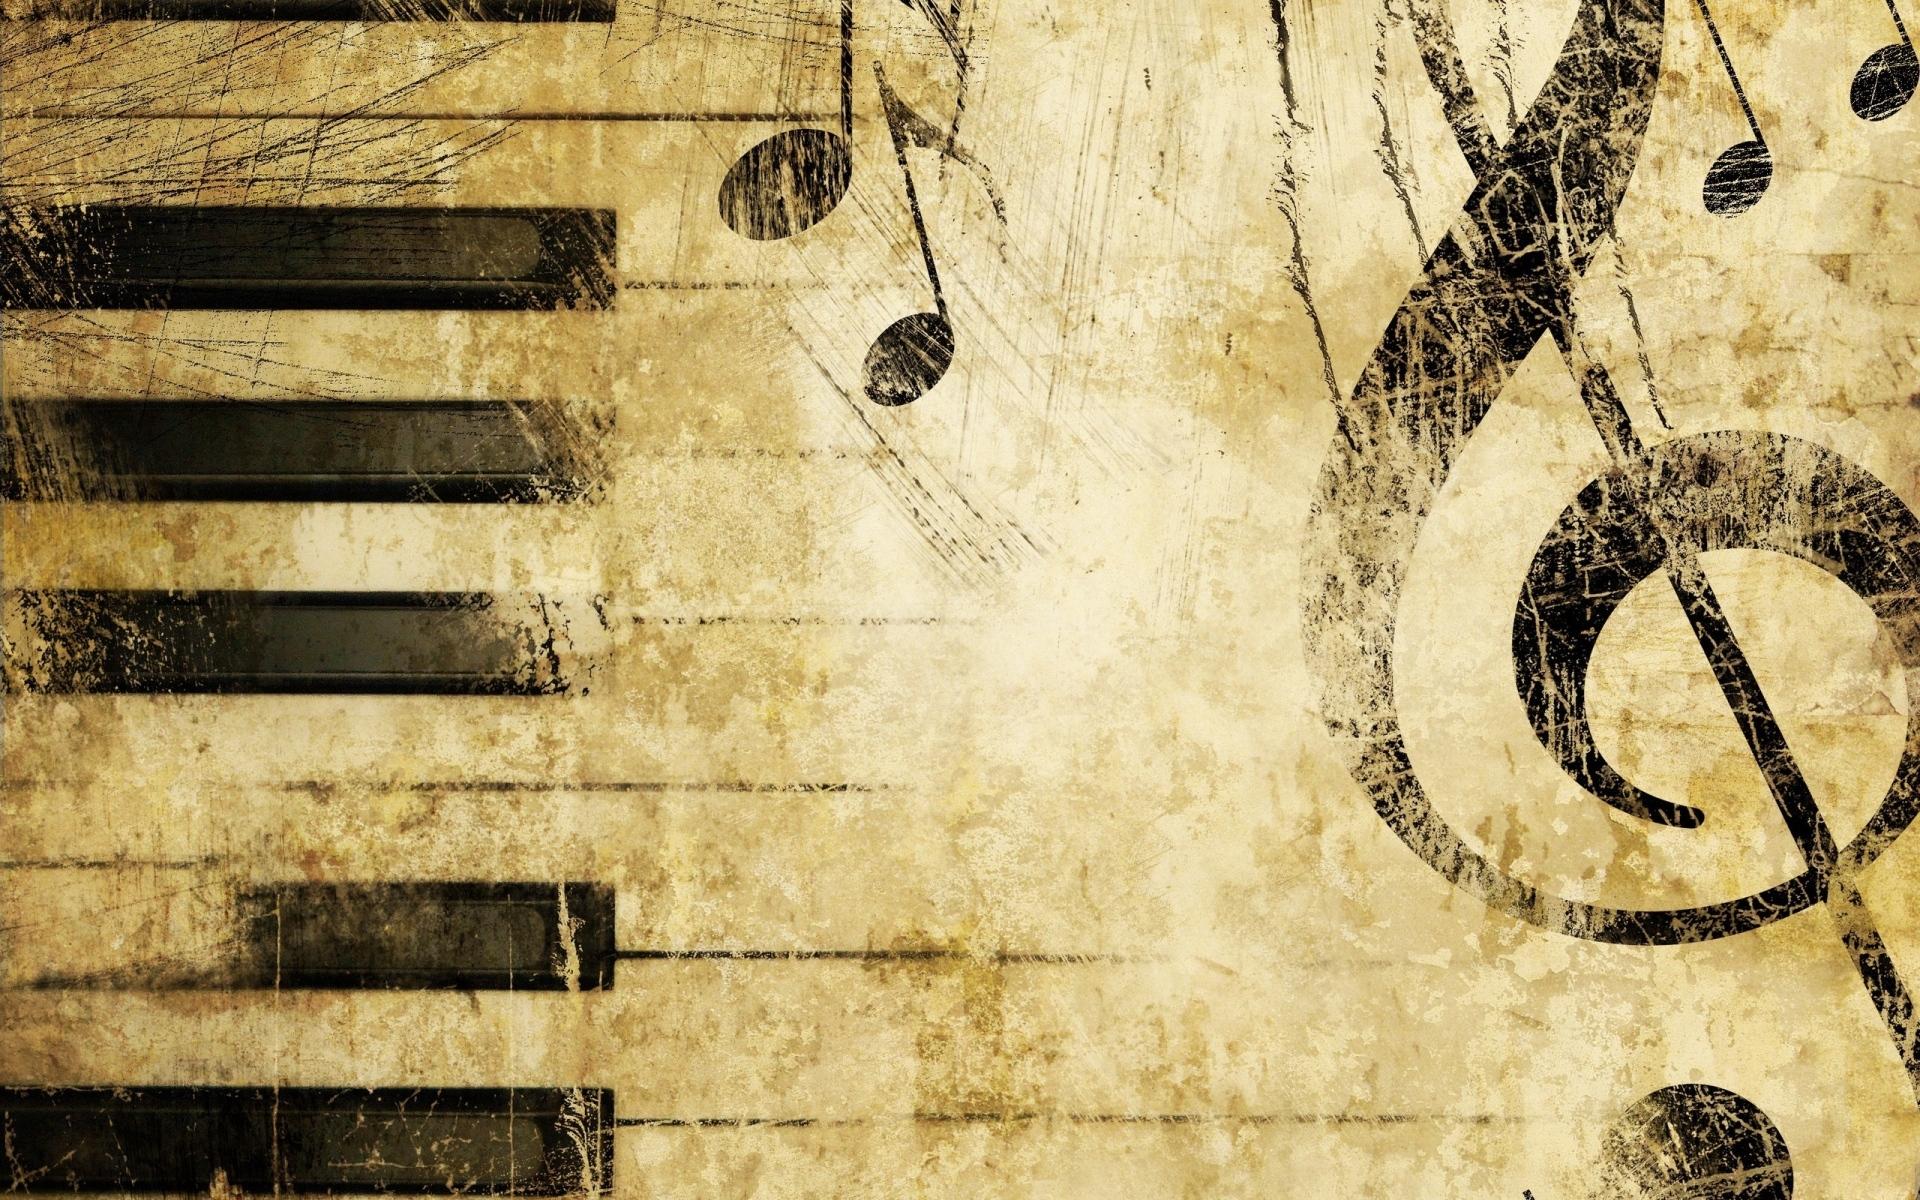 Февраля, картинки на тему музыки дизайн